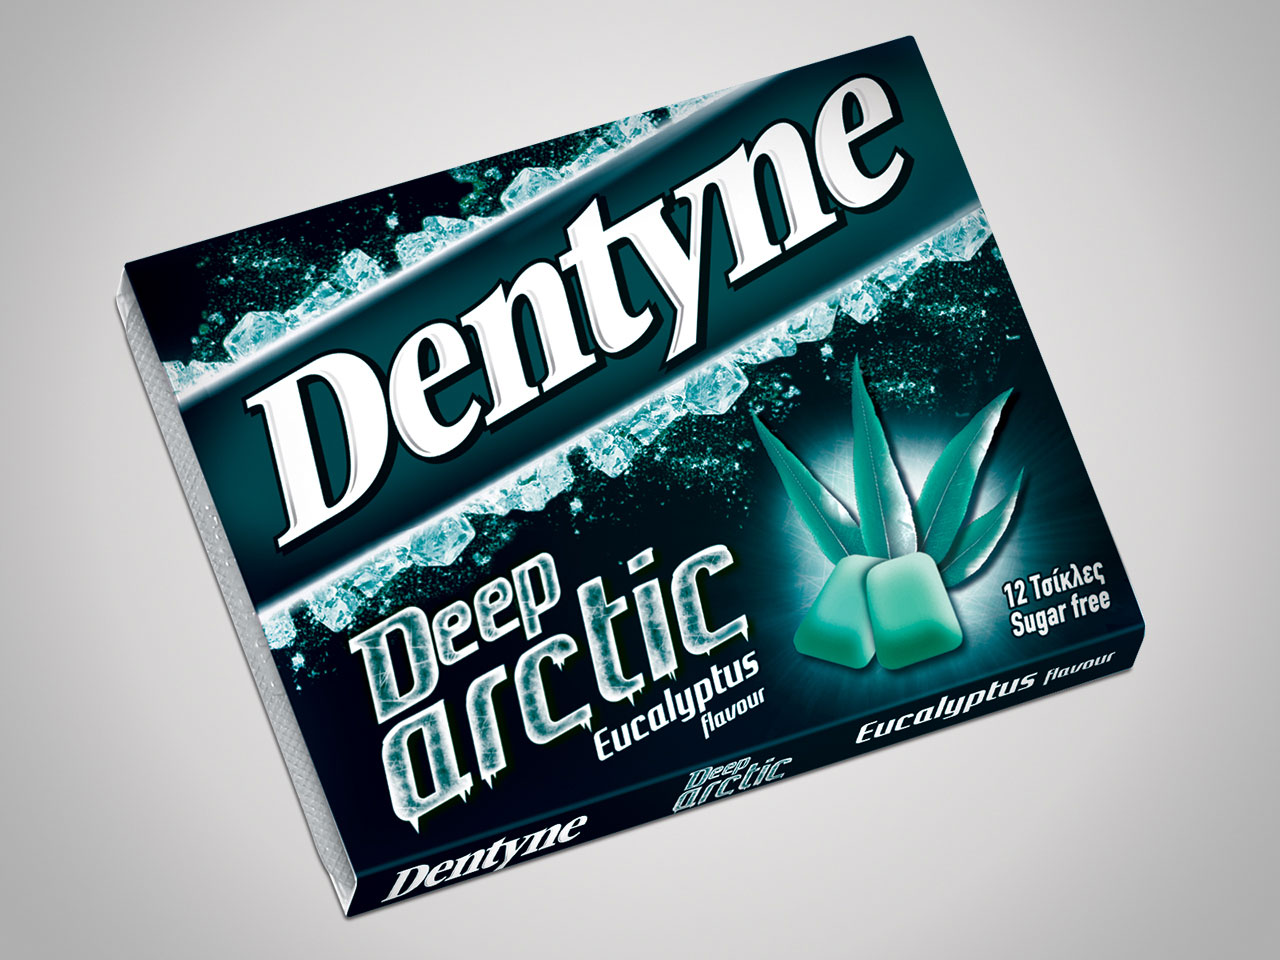 Dentyne Deep Arctic eucalyptus flavour